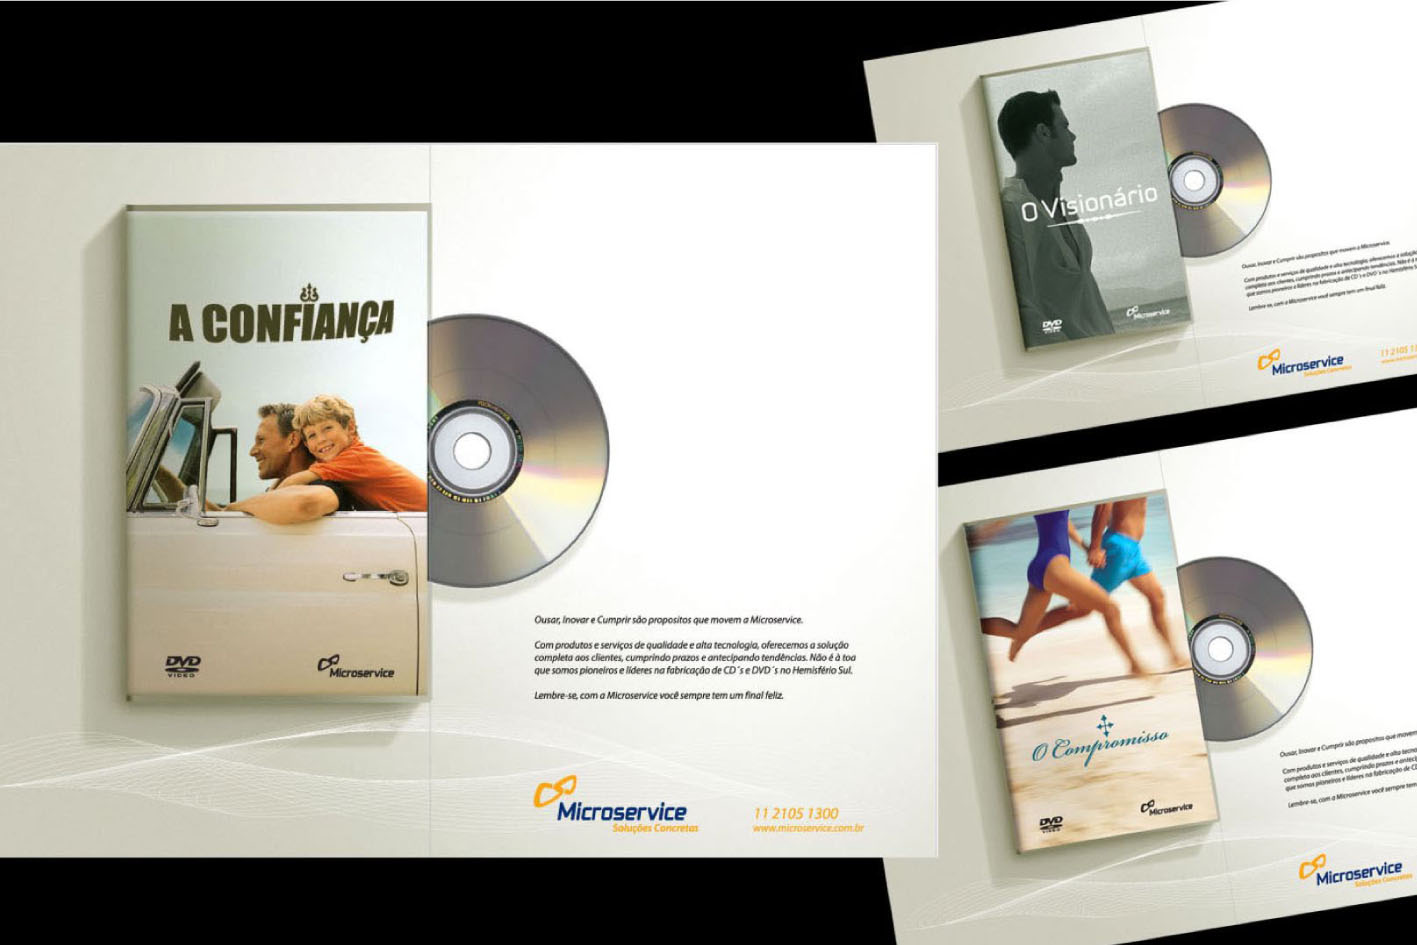 Microservice fabricante de CDs e DVDs